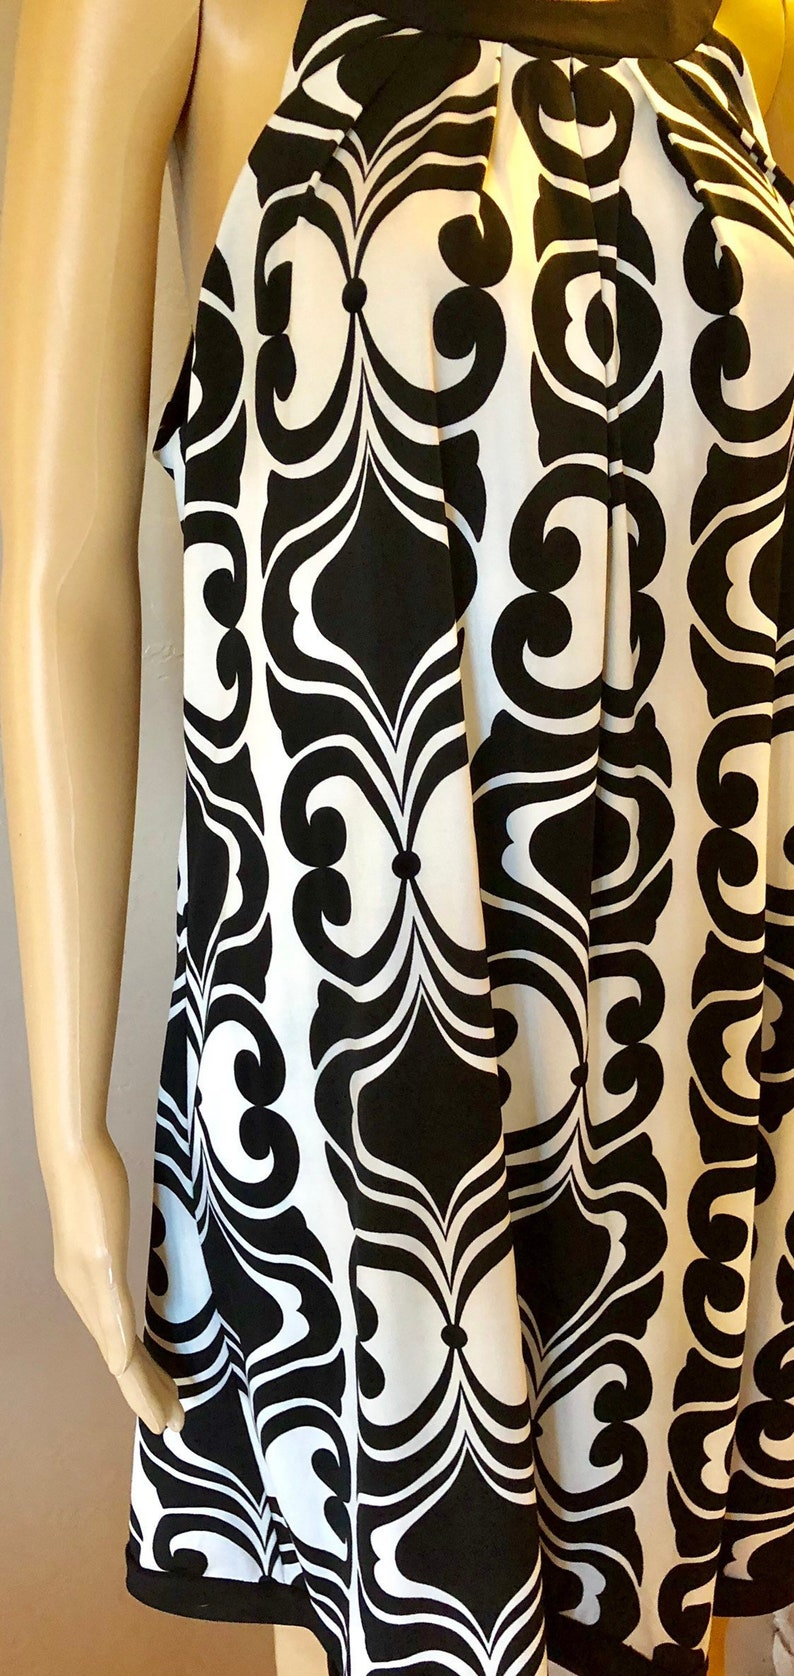 slip over dress Off Ivory and black patterened dress 90/'s B Smart Womans A-line Size Large dress Off the shoulder neck collar